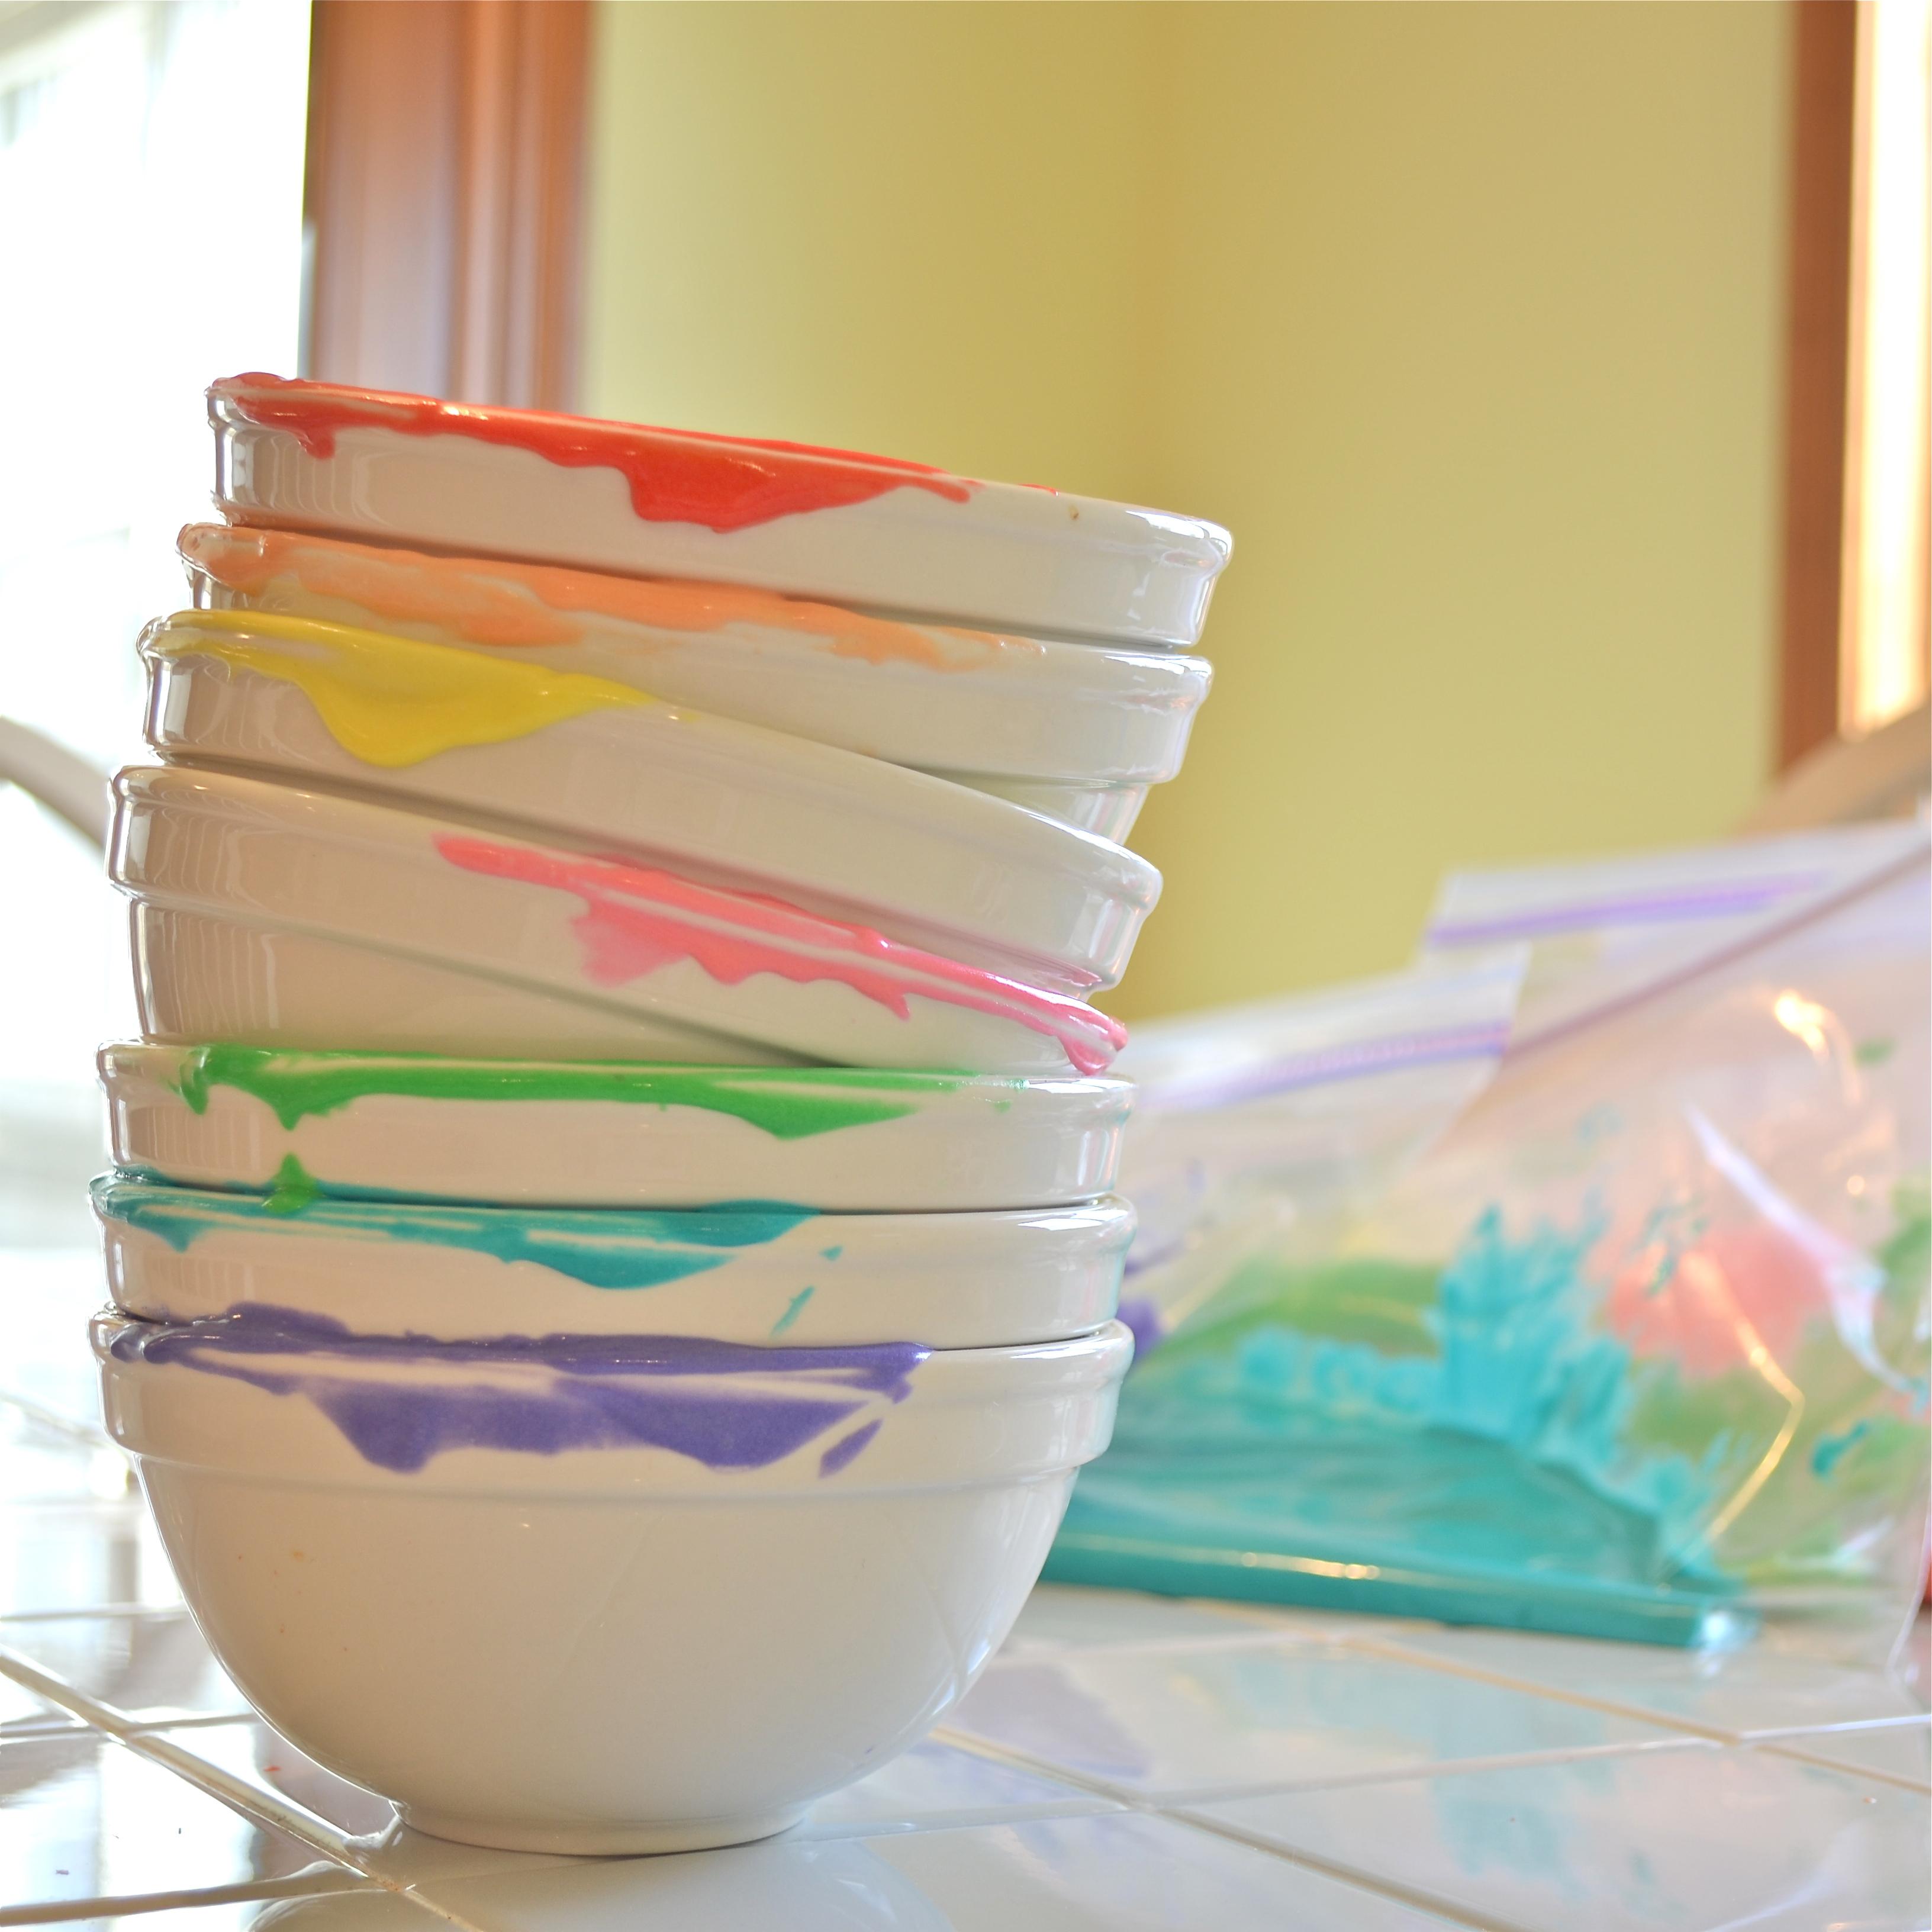 Rainbow dishes!